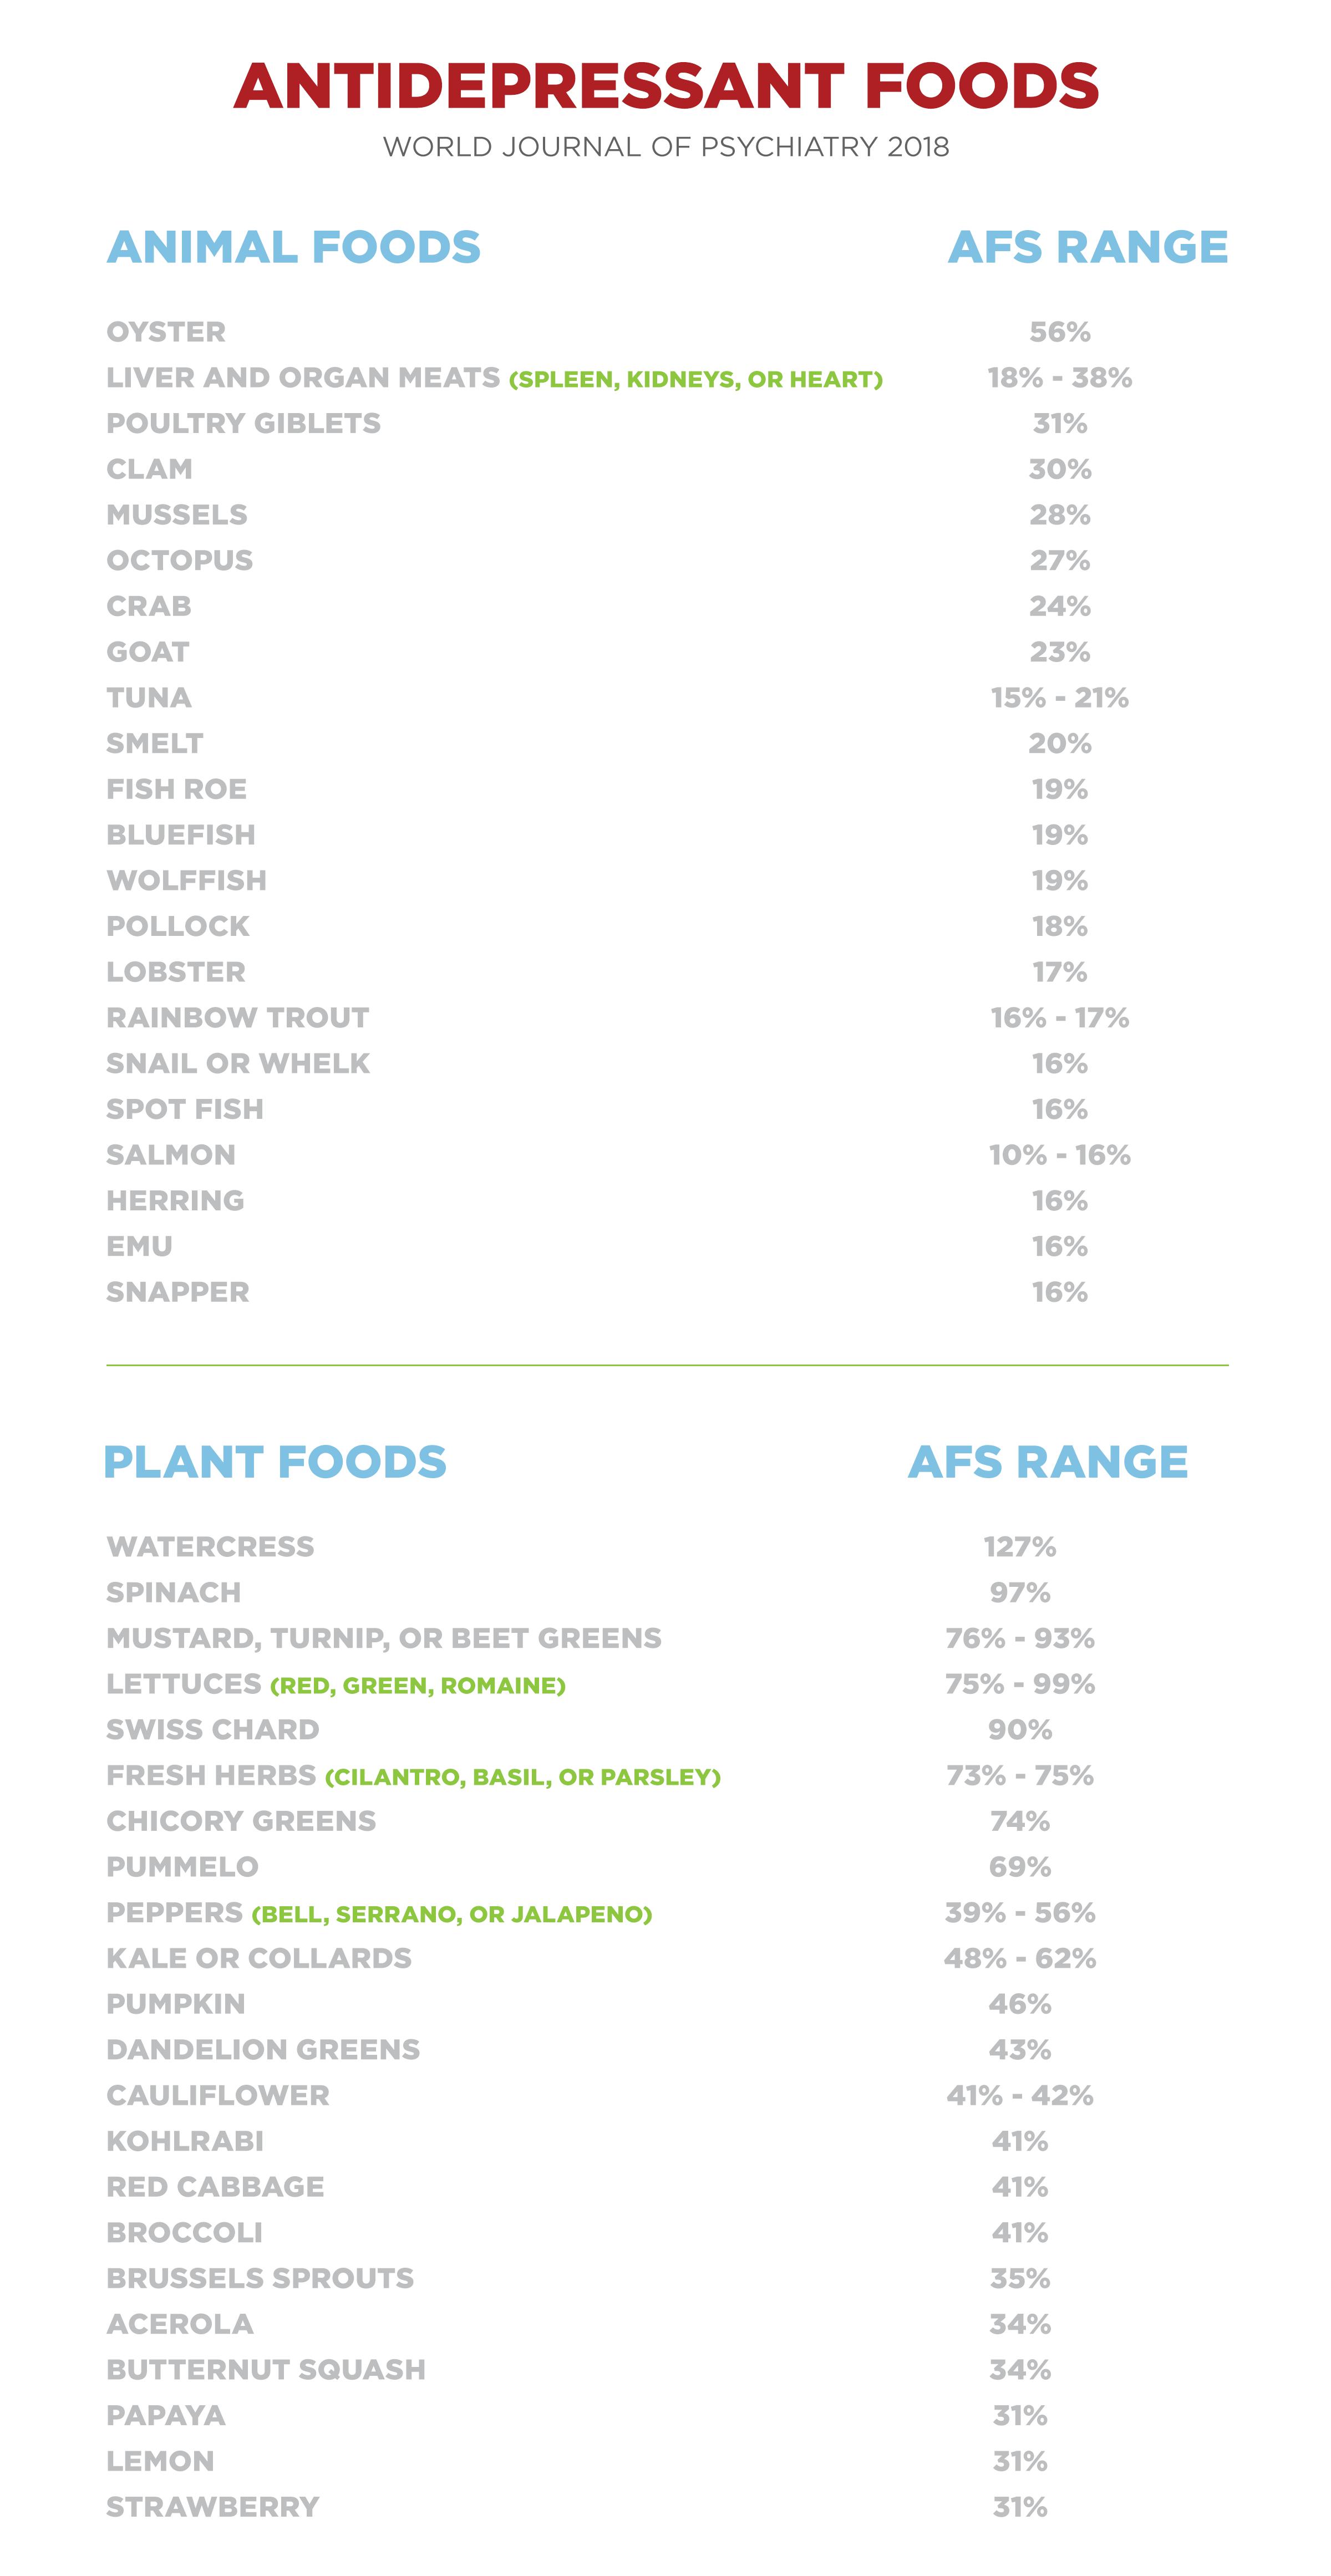 table_antidepressant_foods